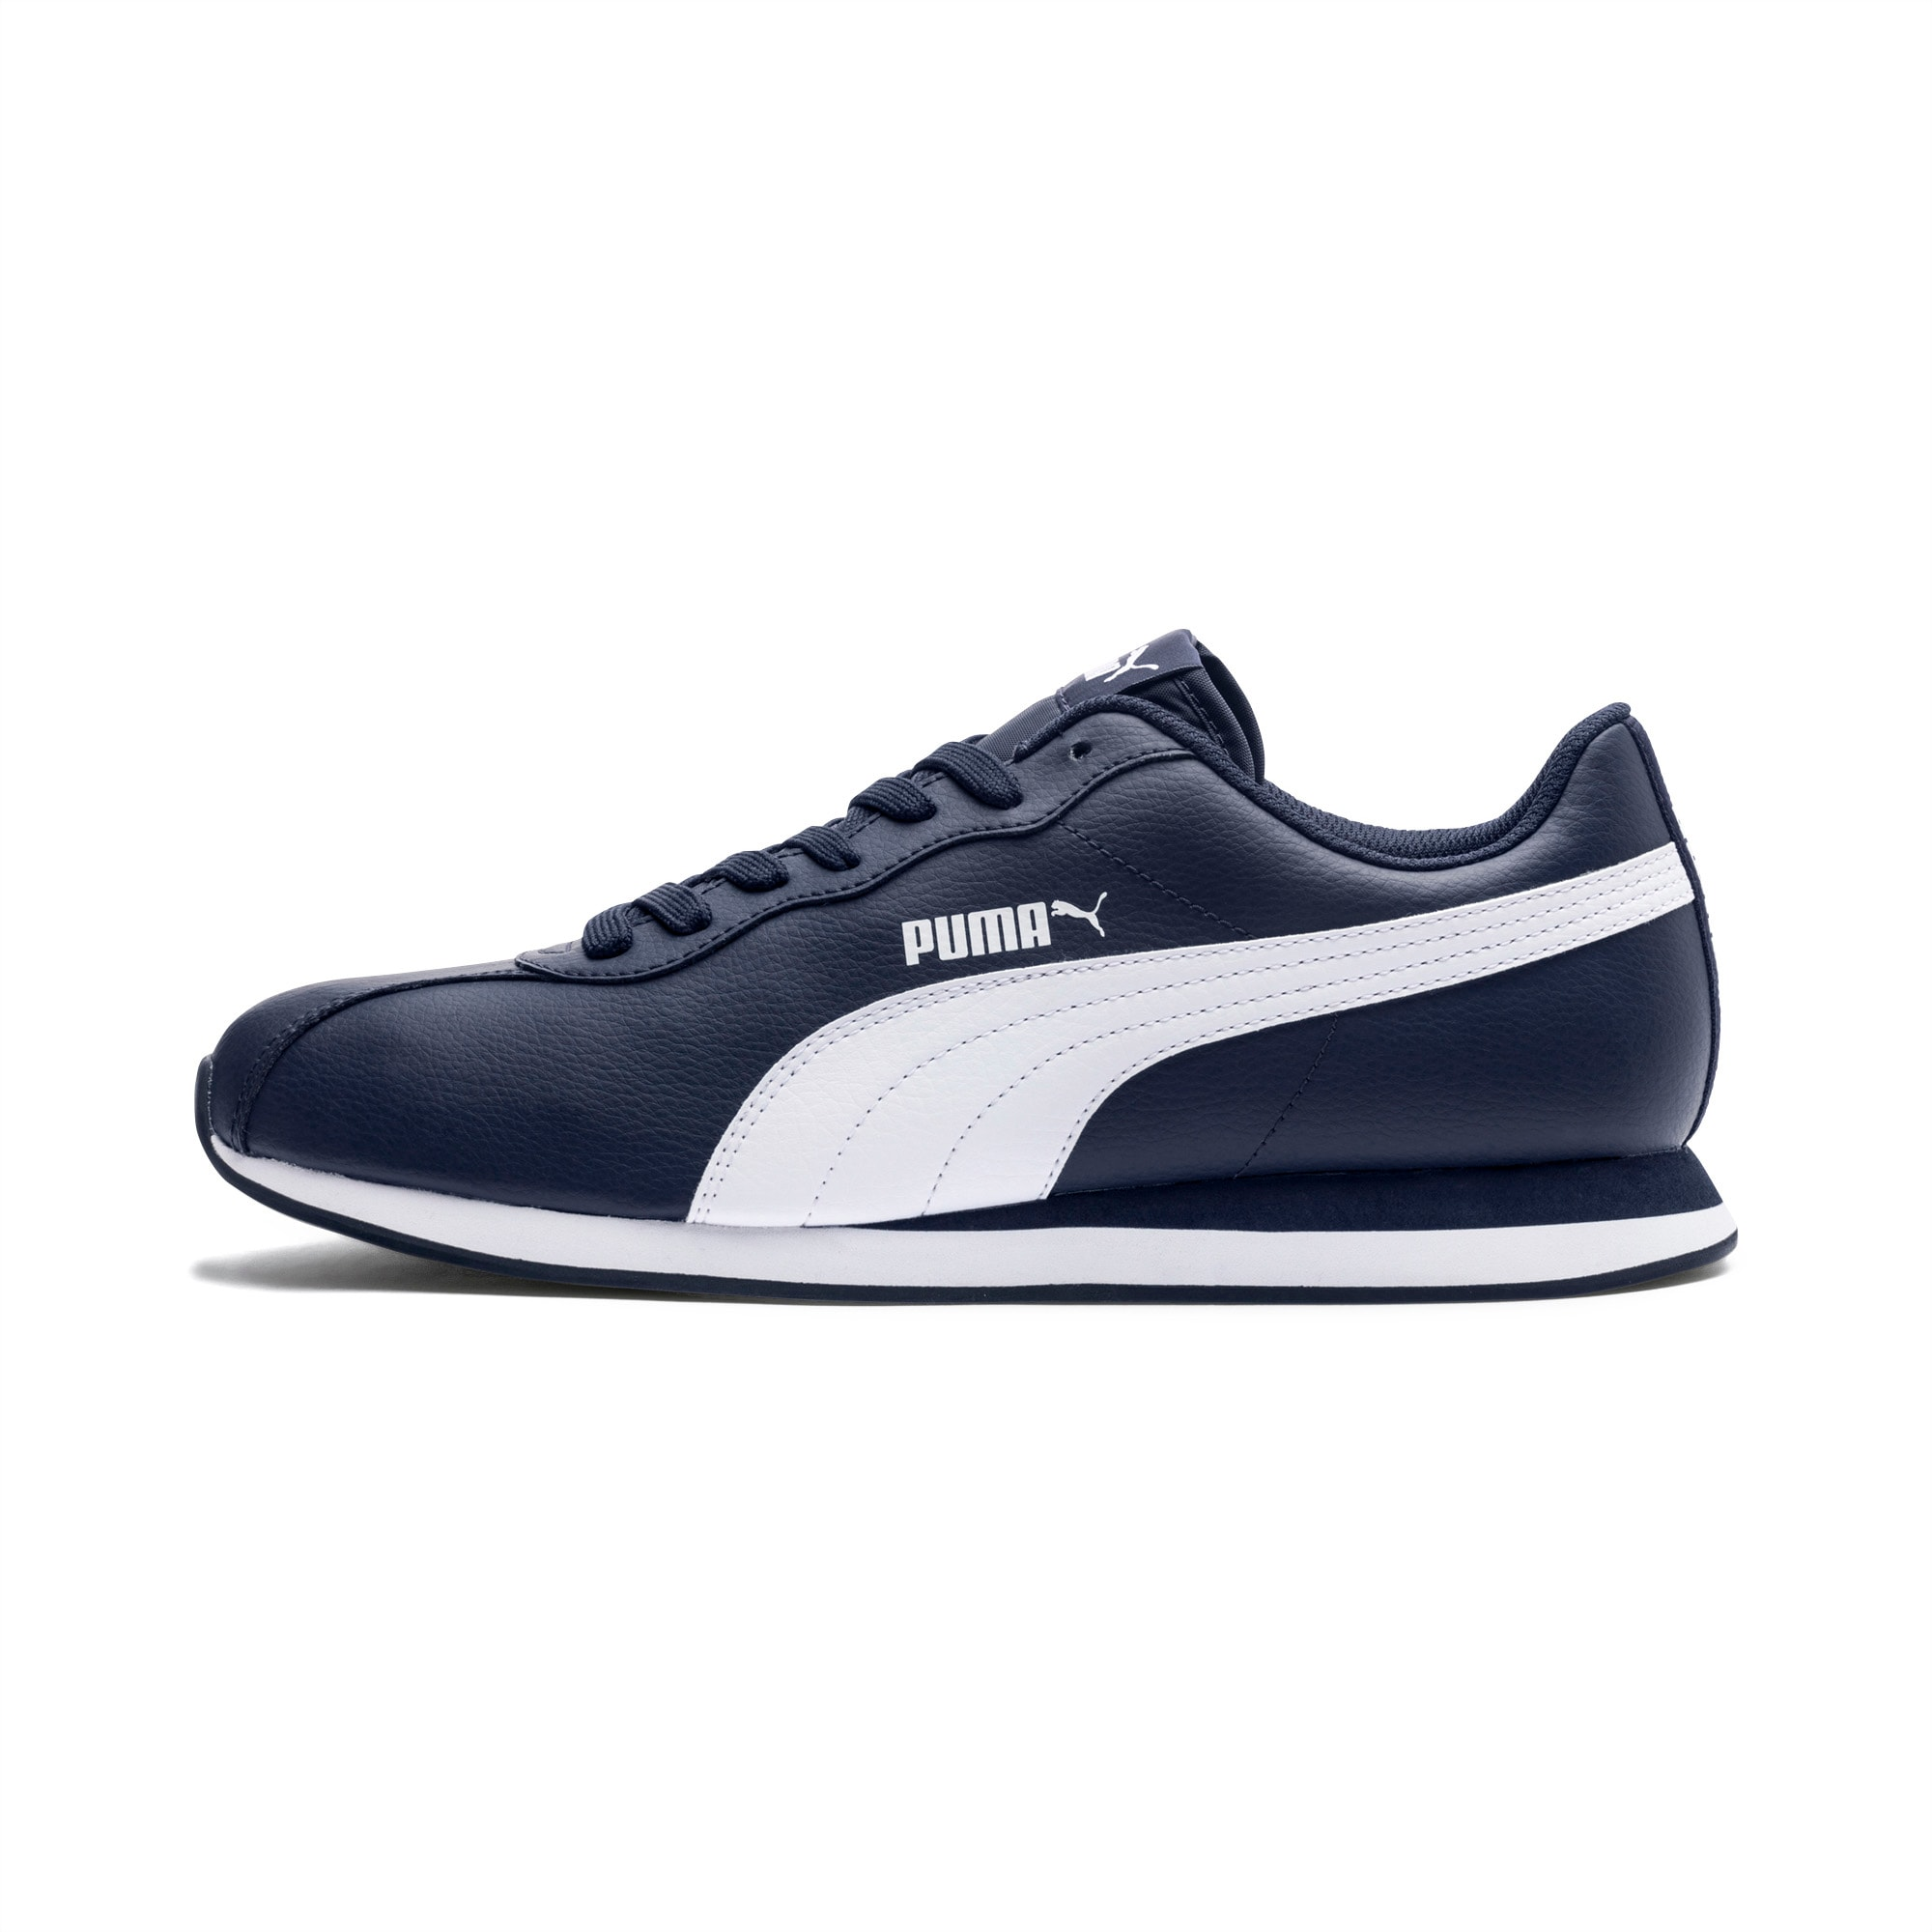 PUMA Turin II Unisex Shoes